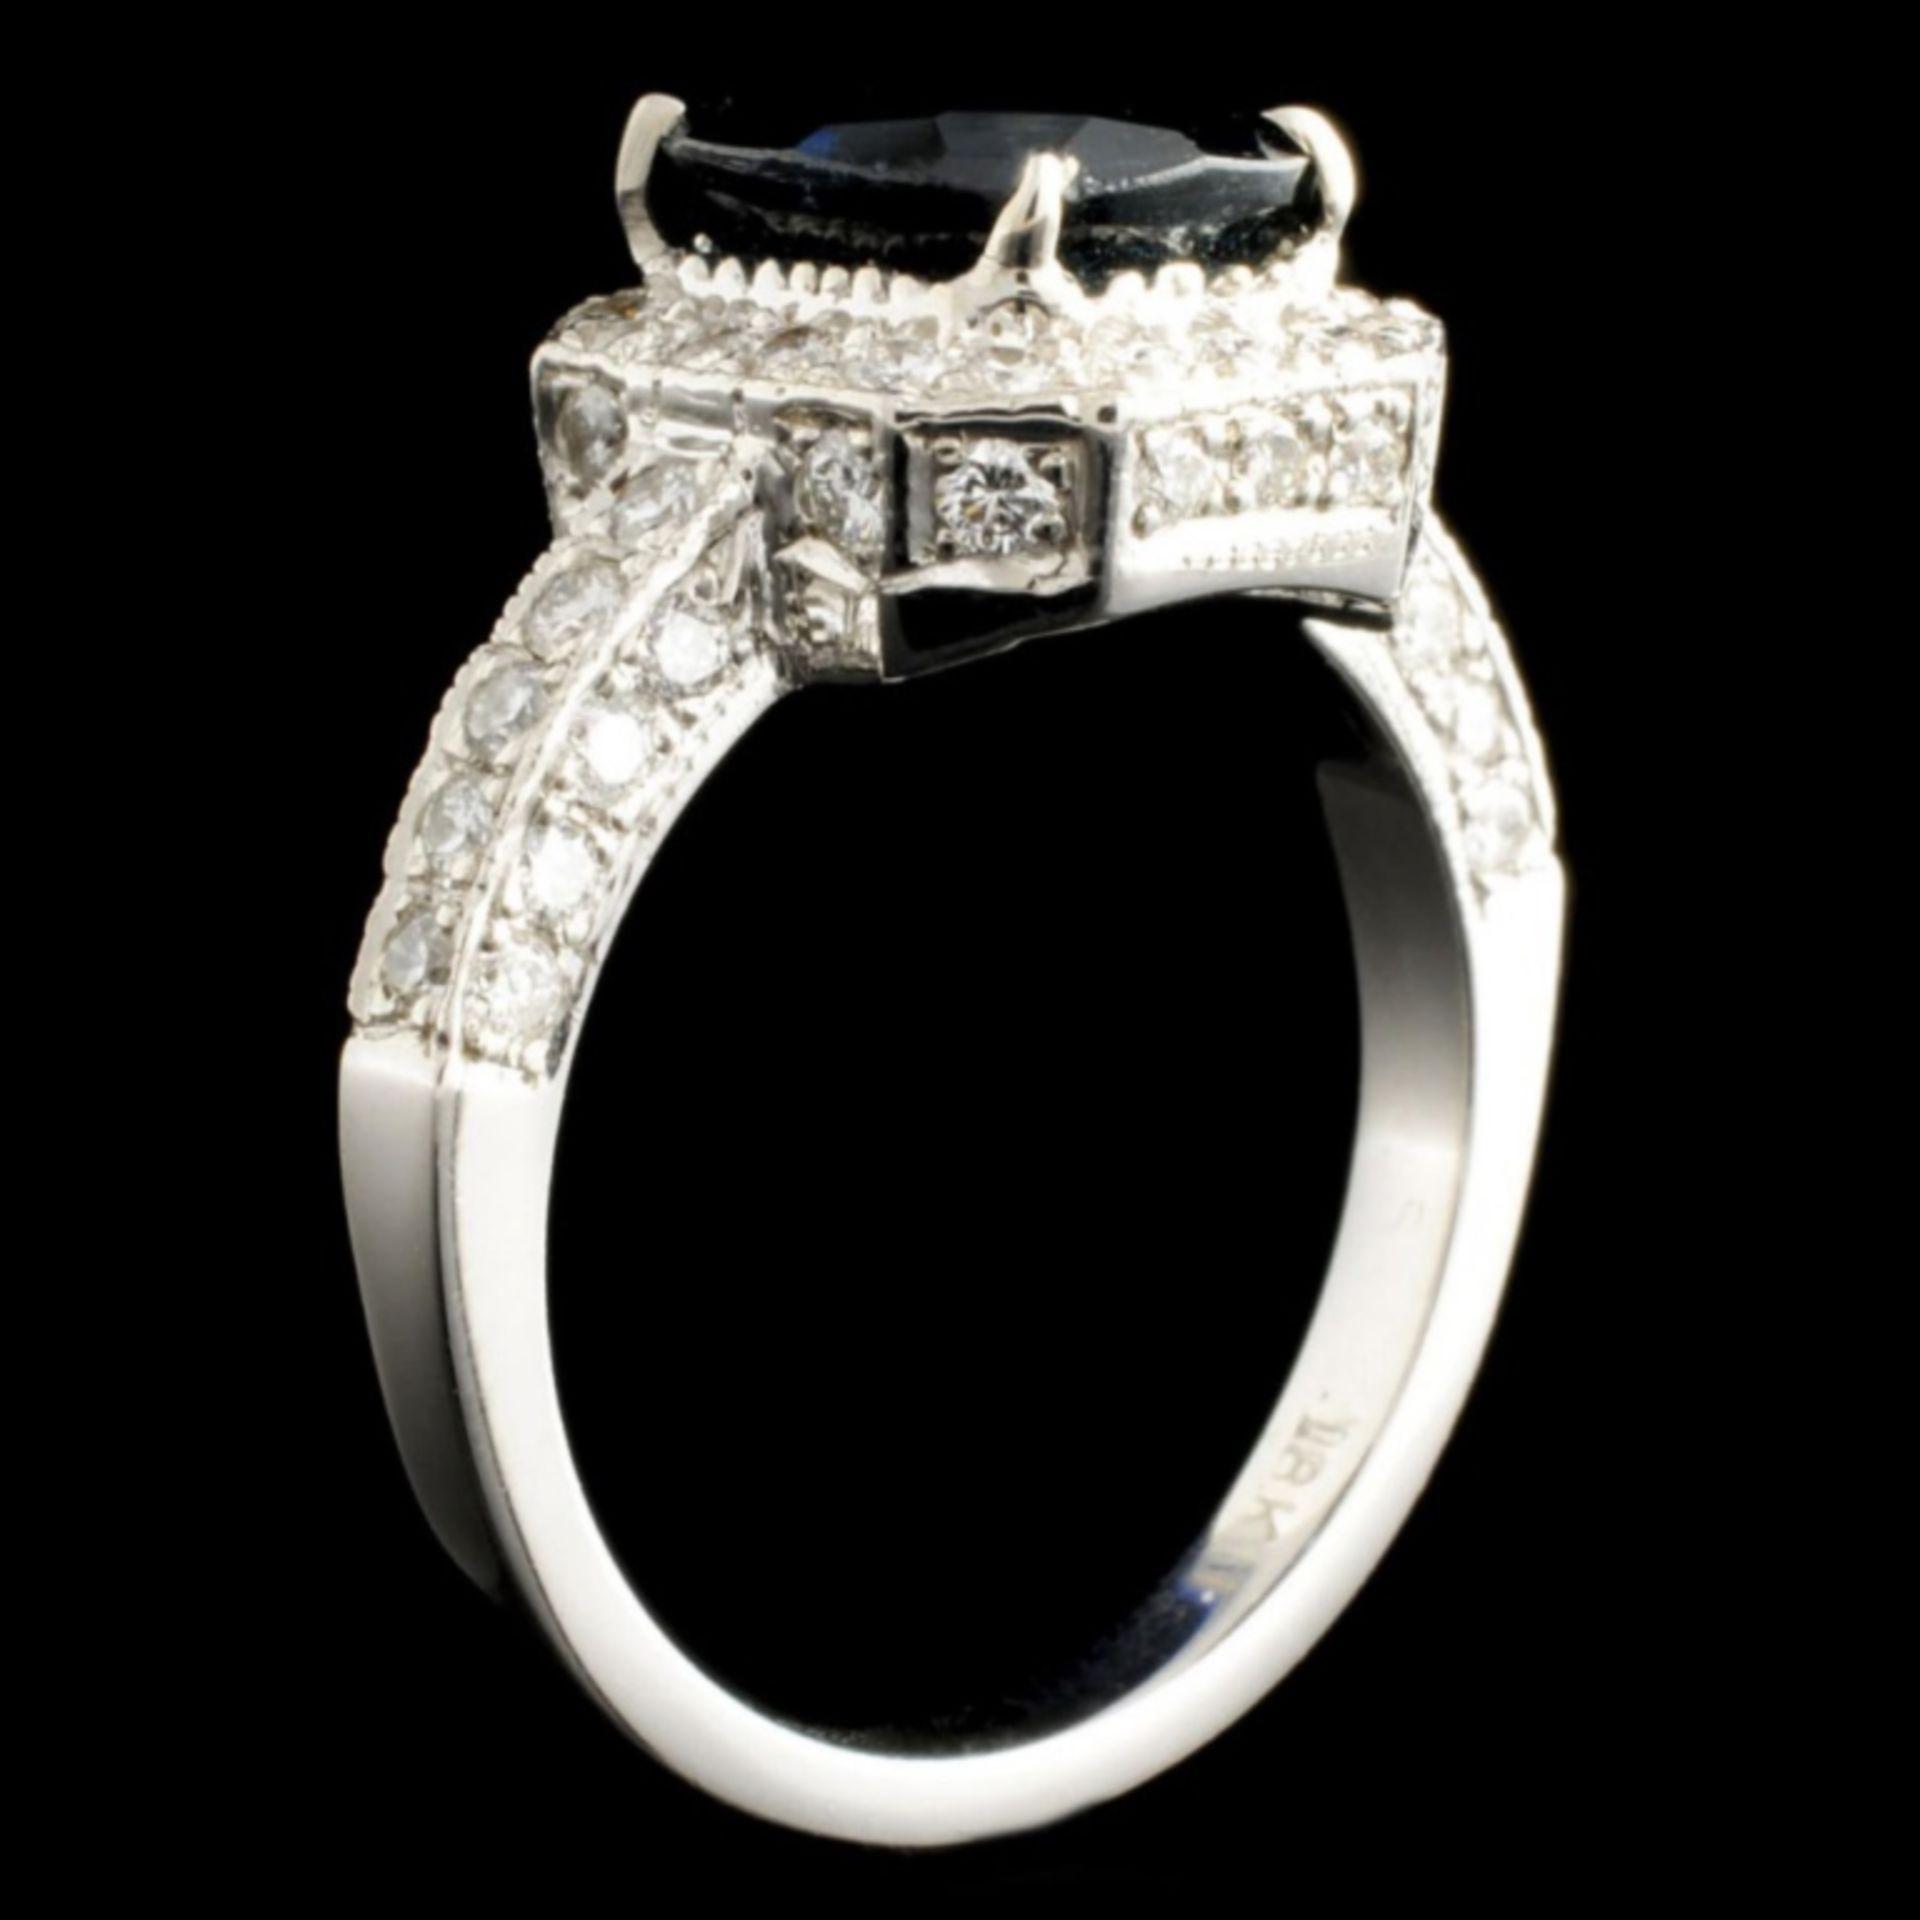 18K Gold 2.50ct Tourmaline & 0.80ctw Diamond Ring - Image 3 of 3